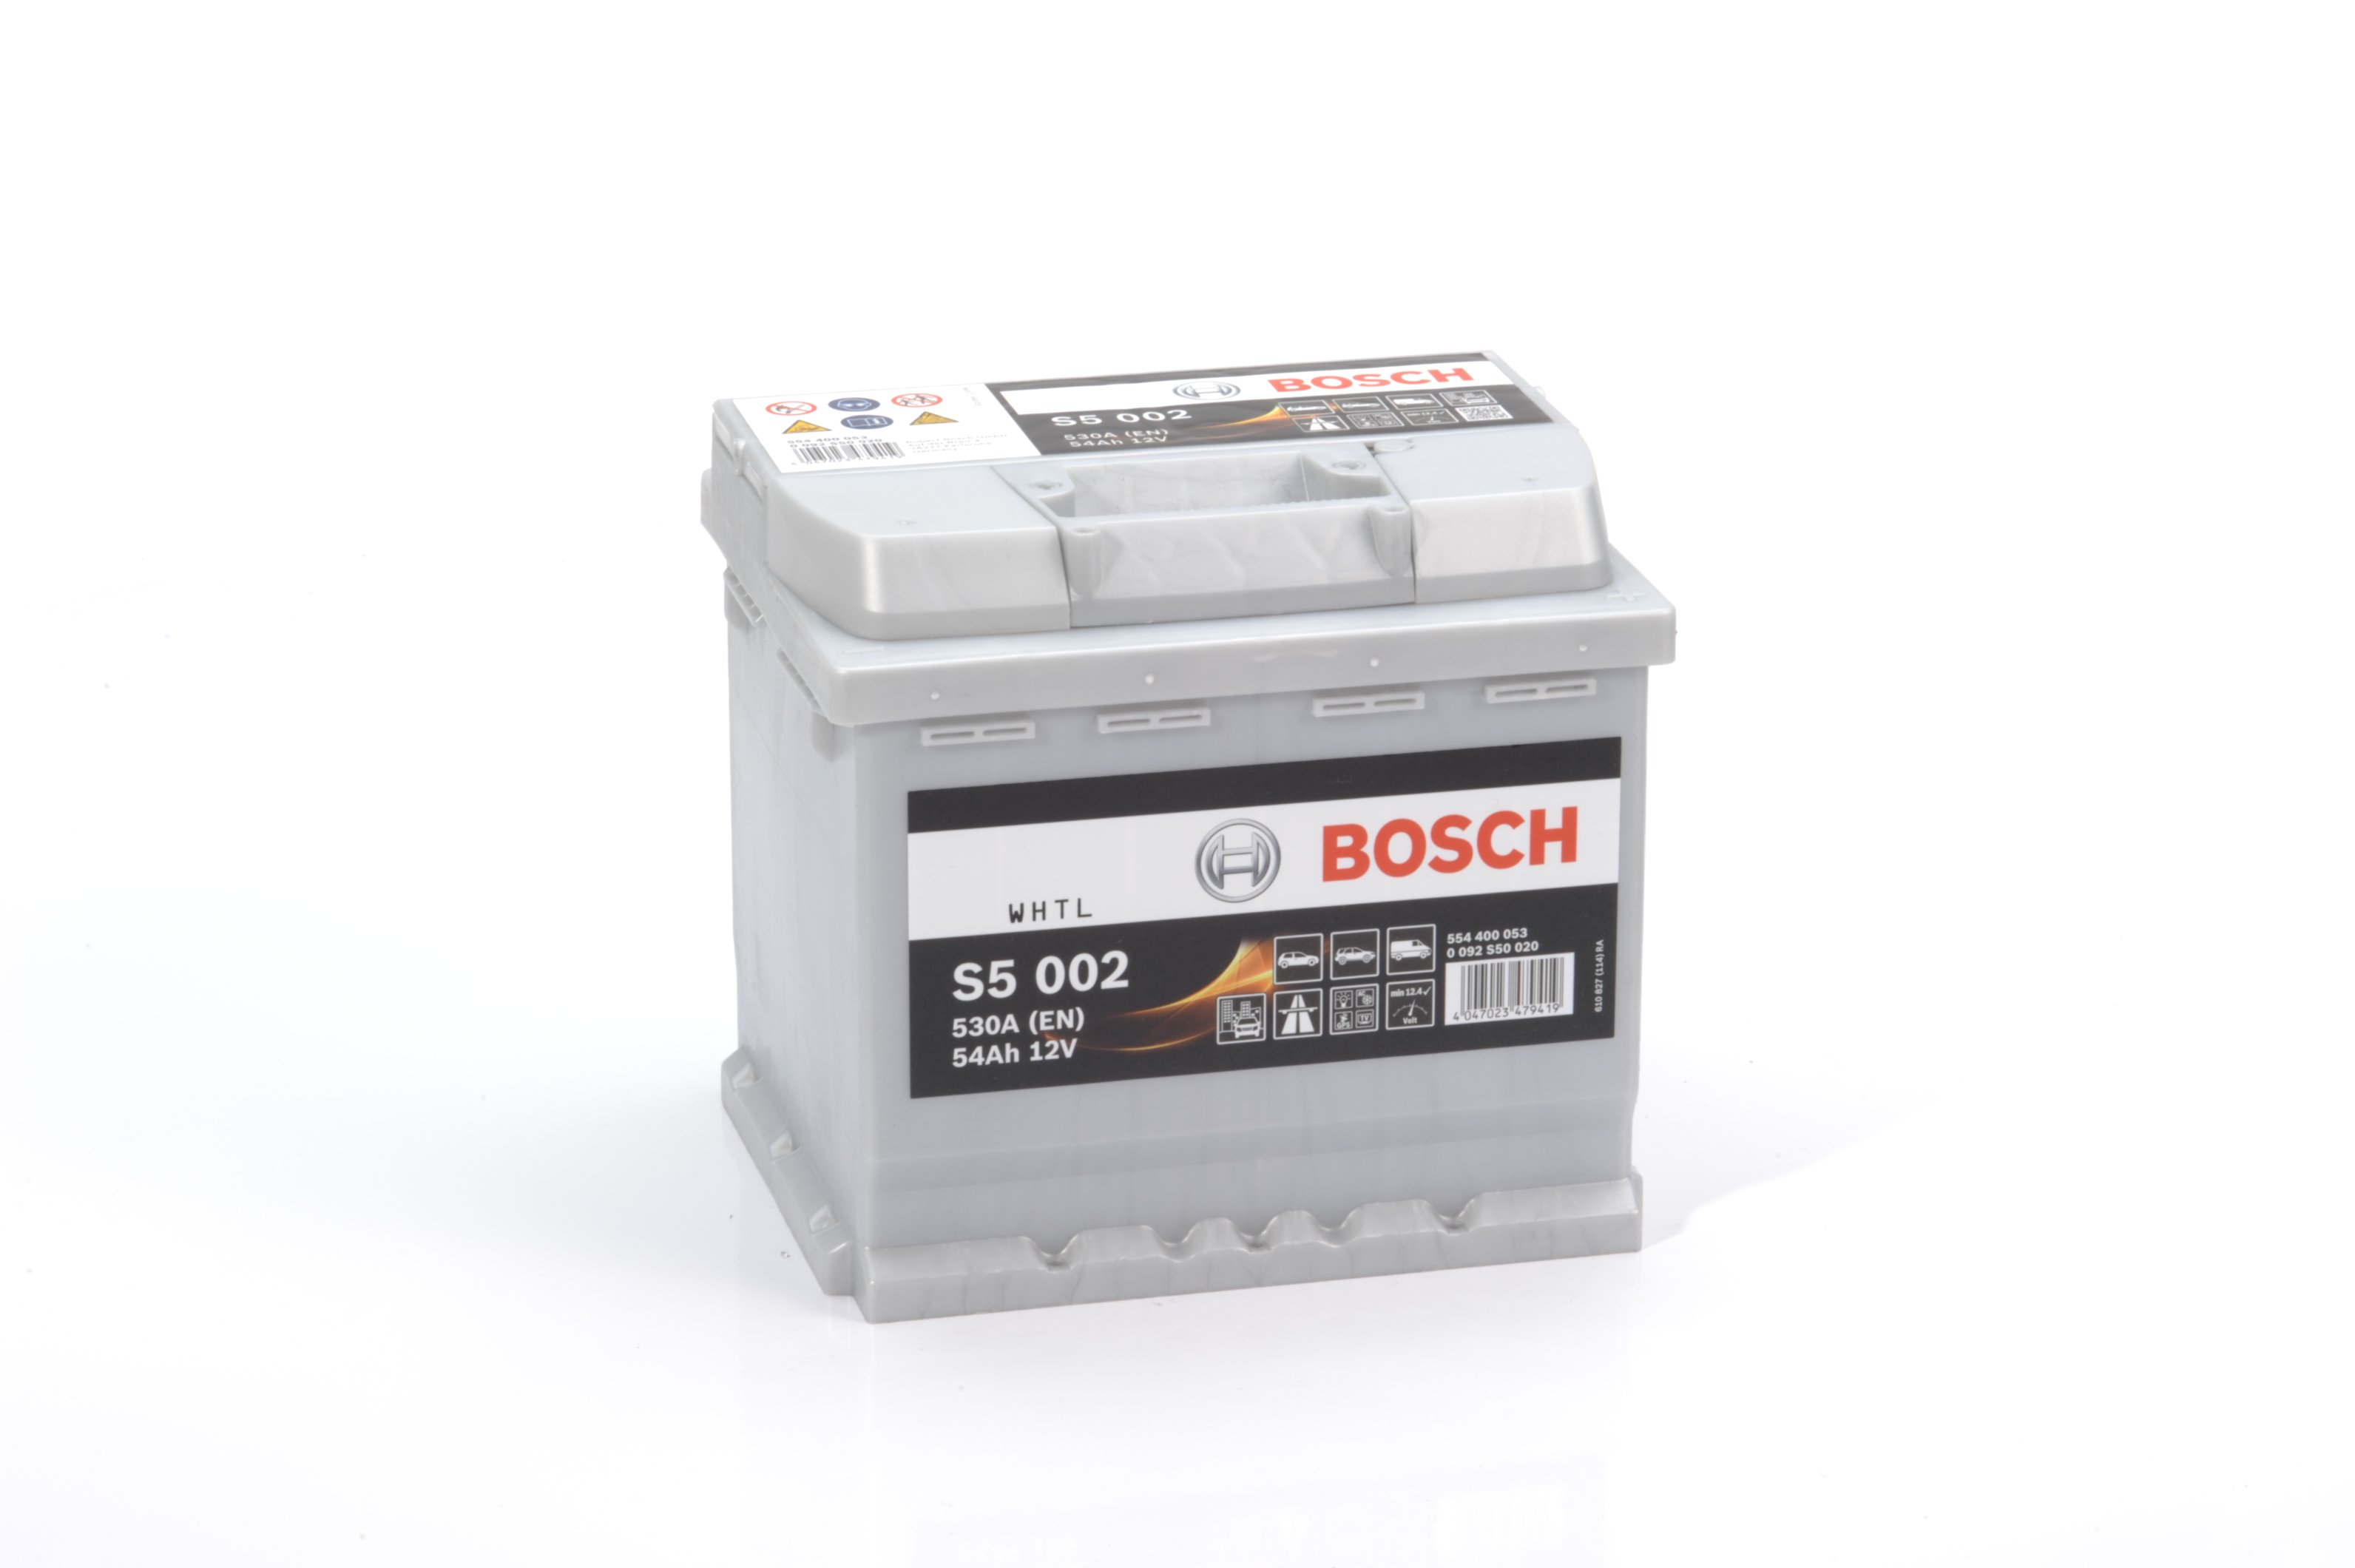 Батарея аккумуляторная Bosch S5 002 12В 54Ач 530A(EN) R+ Bosch 0 092 S50 020 - фото 9